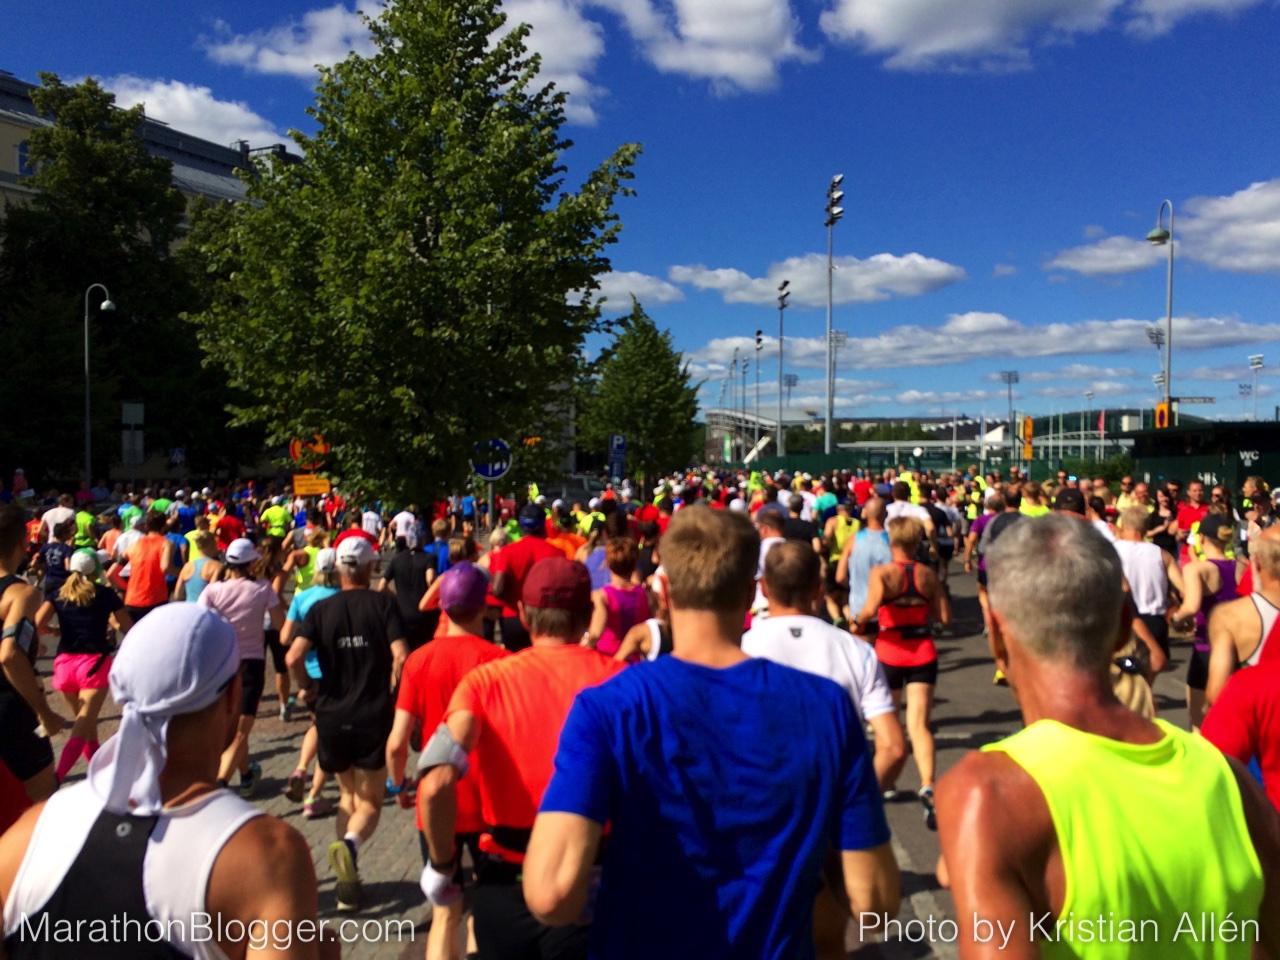 15.8.2015 42.65 km Marathon Run